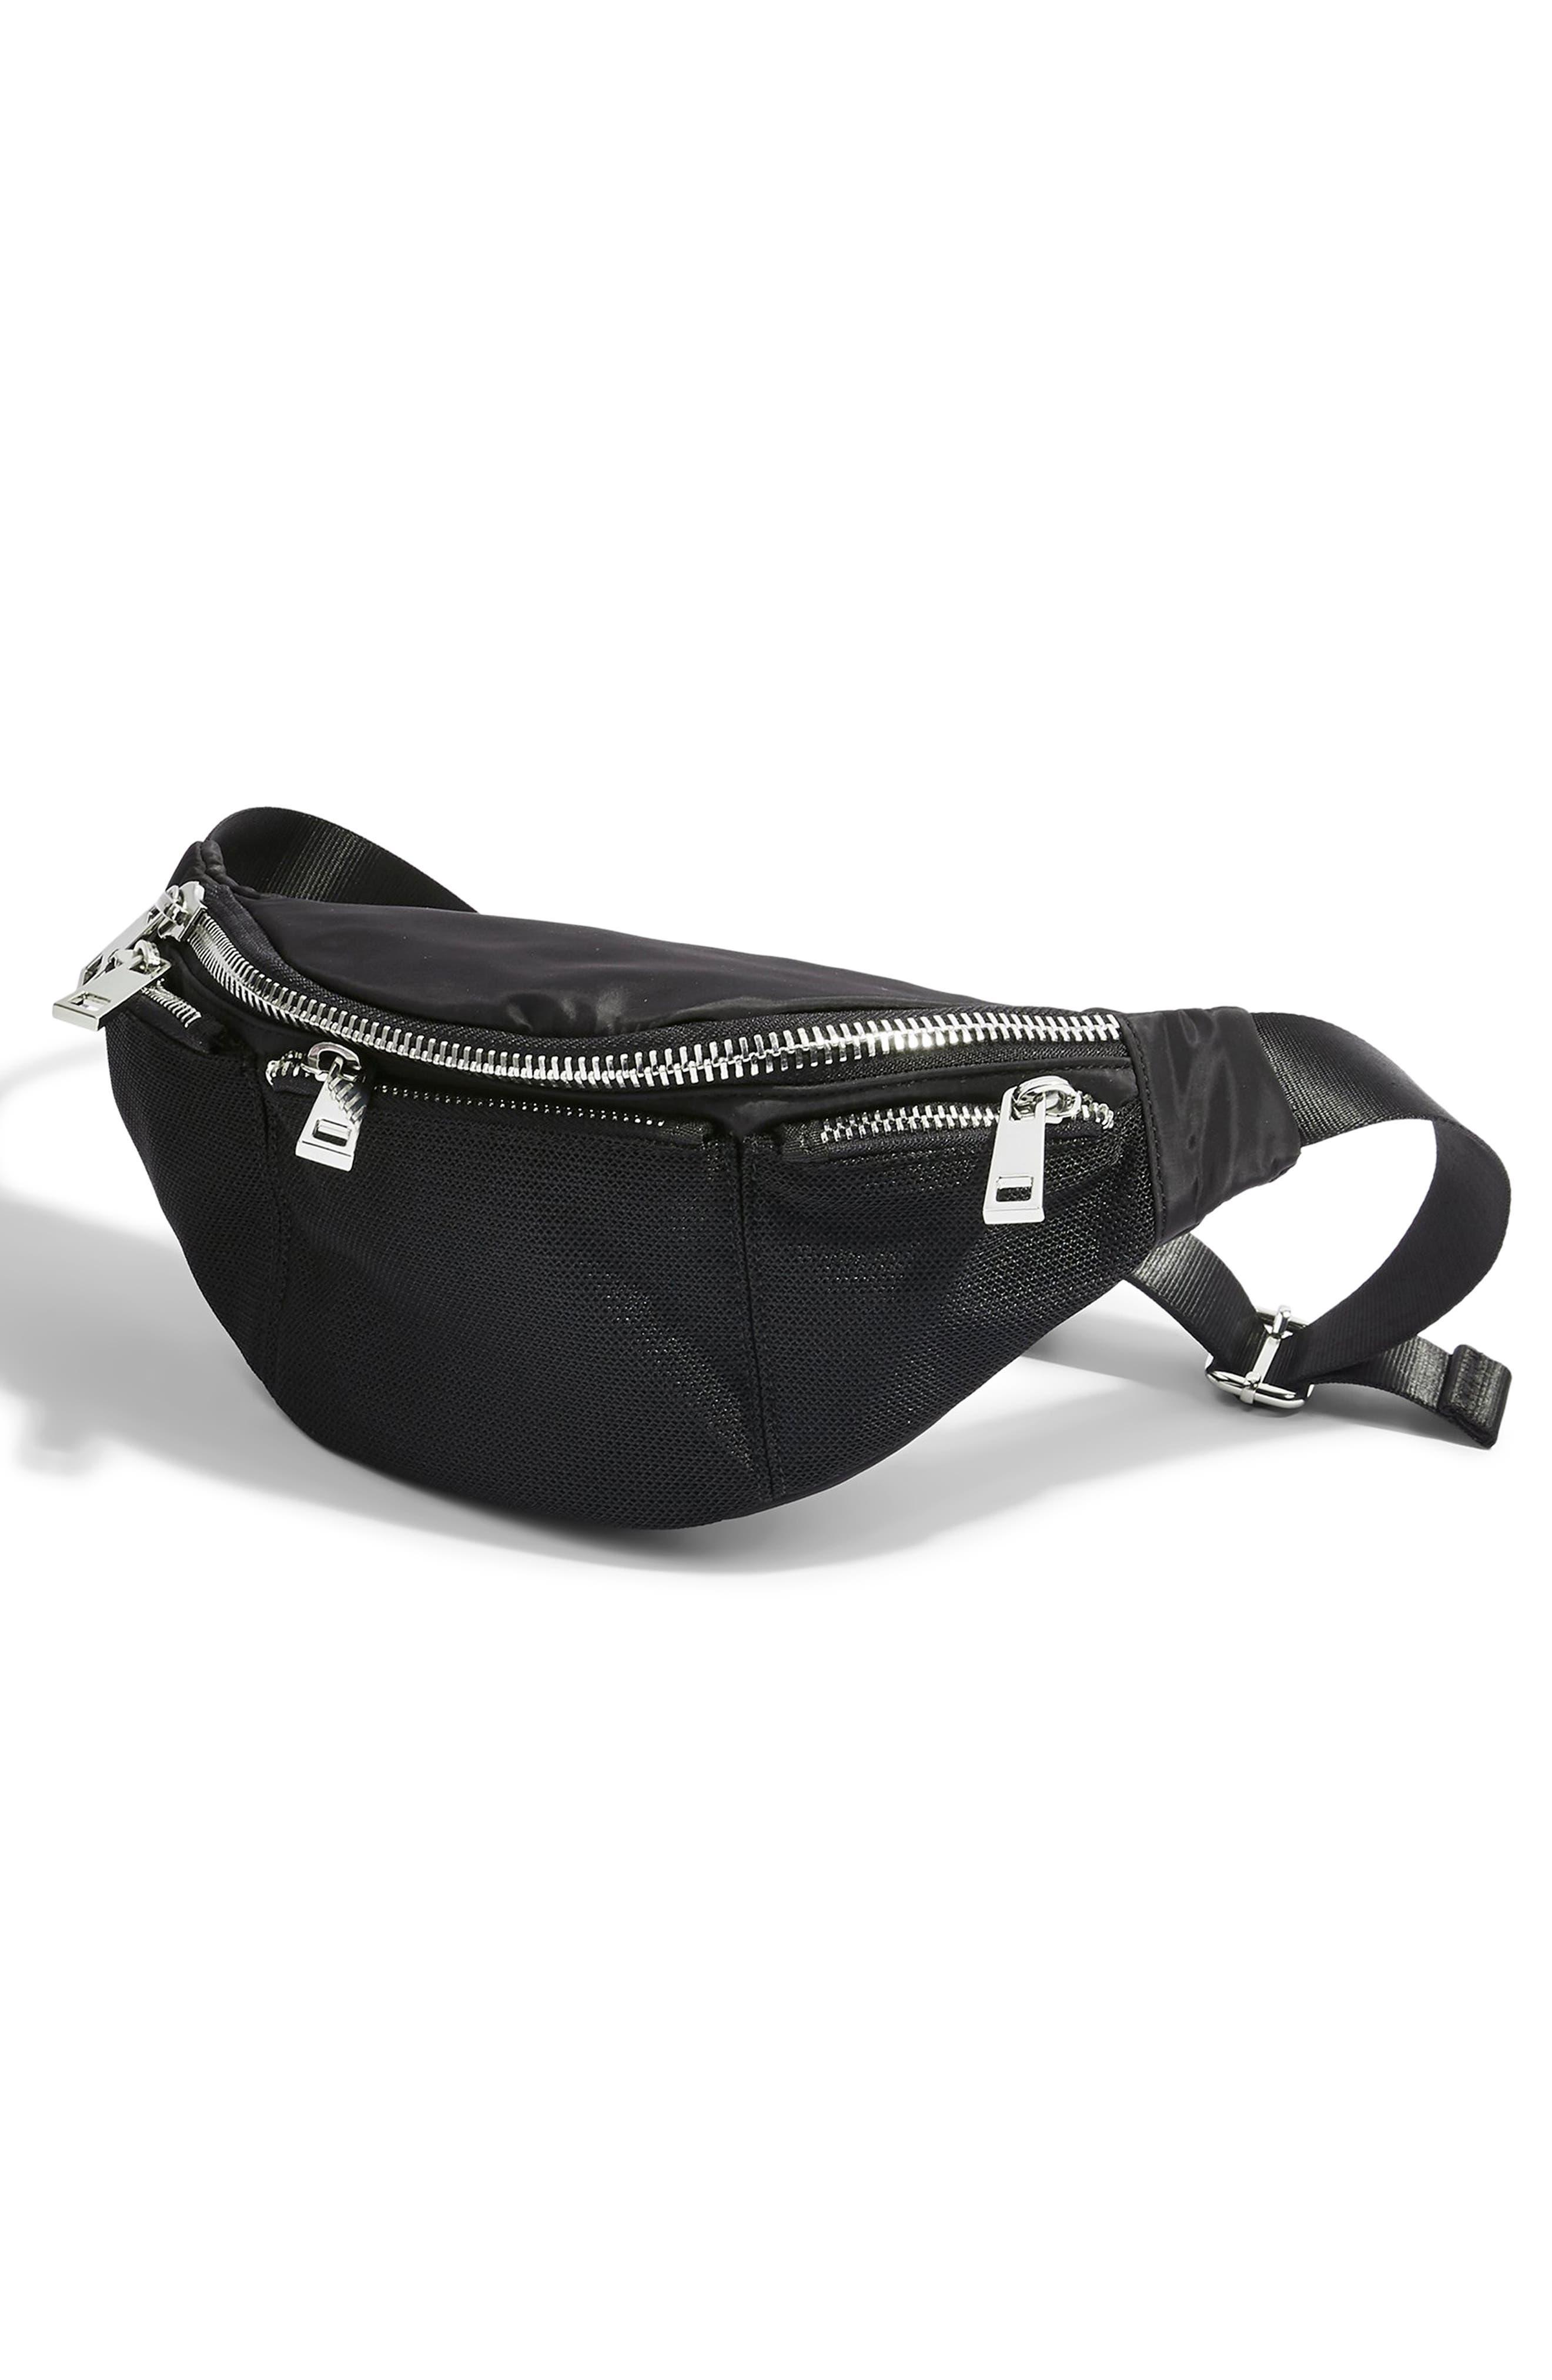 TOPSHOP, Warsaw Nylon Belt Bag, Alternate thumbnail 6, color, BLACK